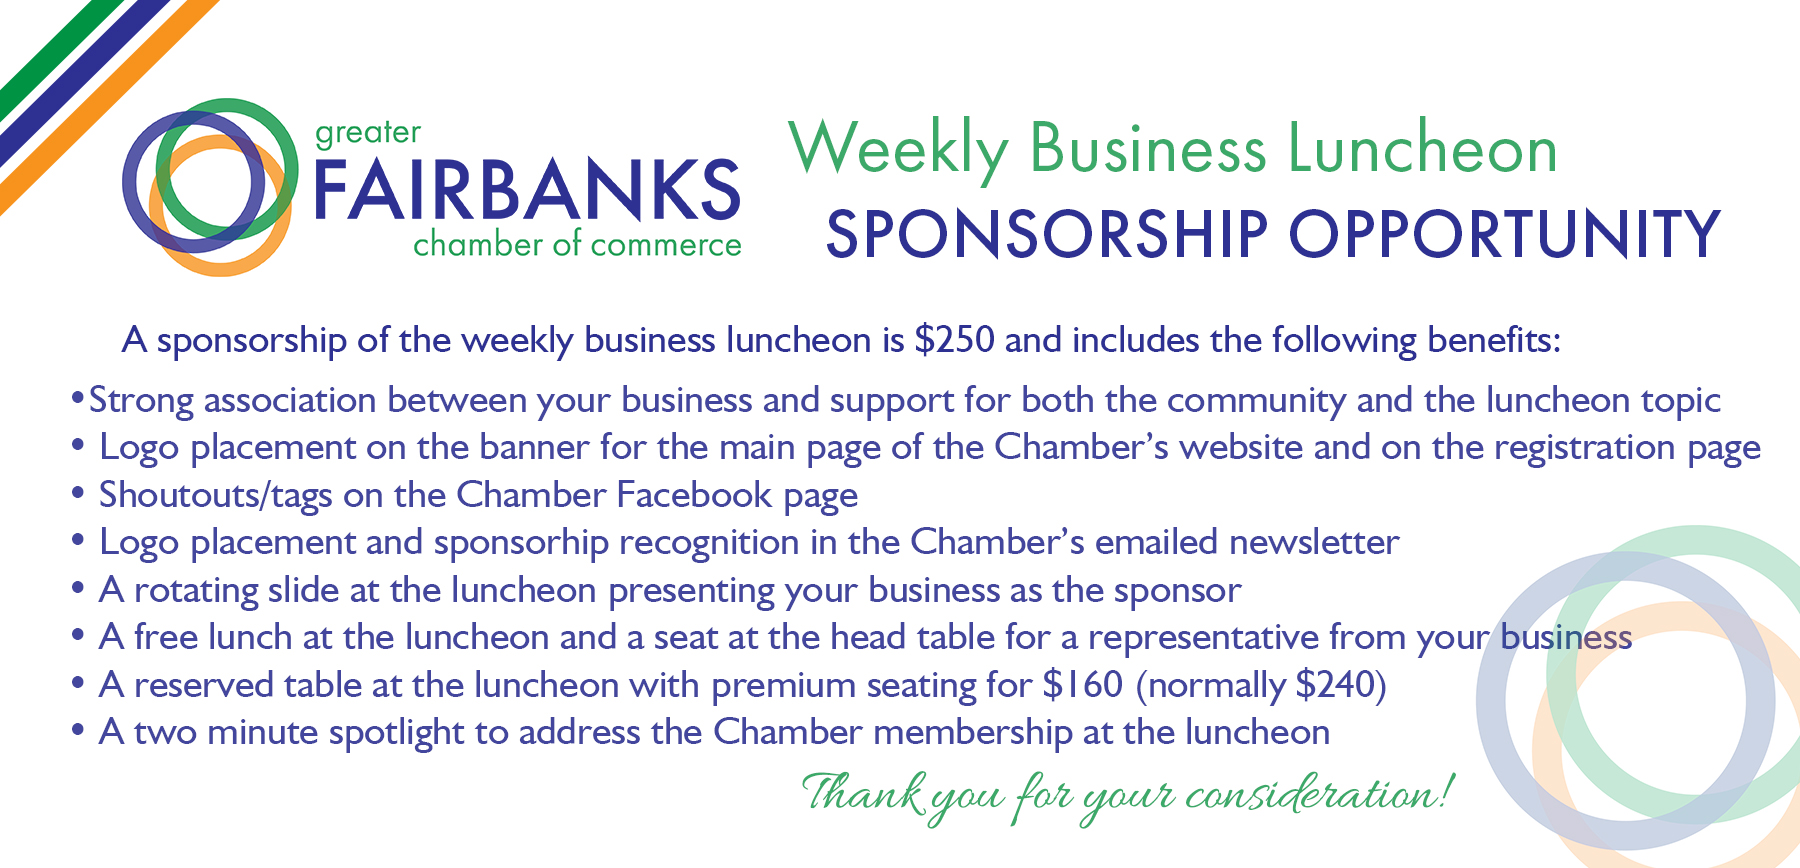 WBL-Sponsorship-Graphic(1).jpg